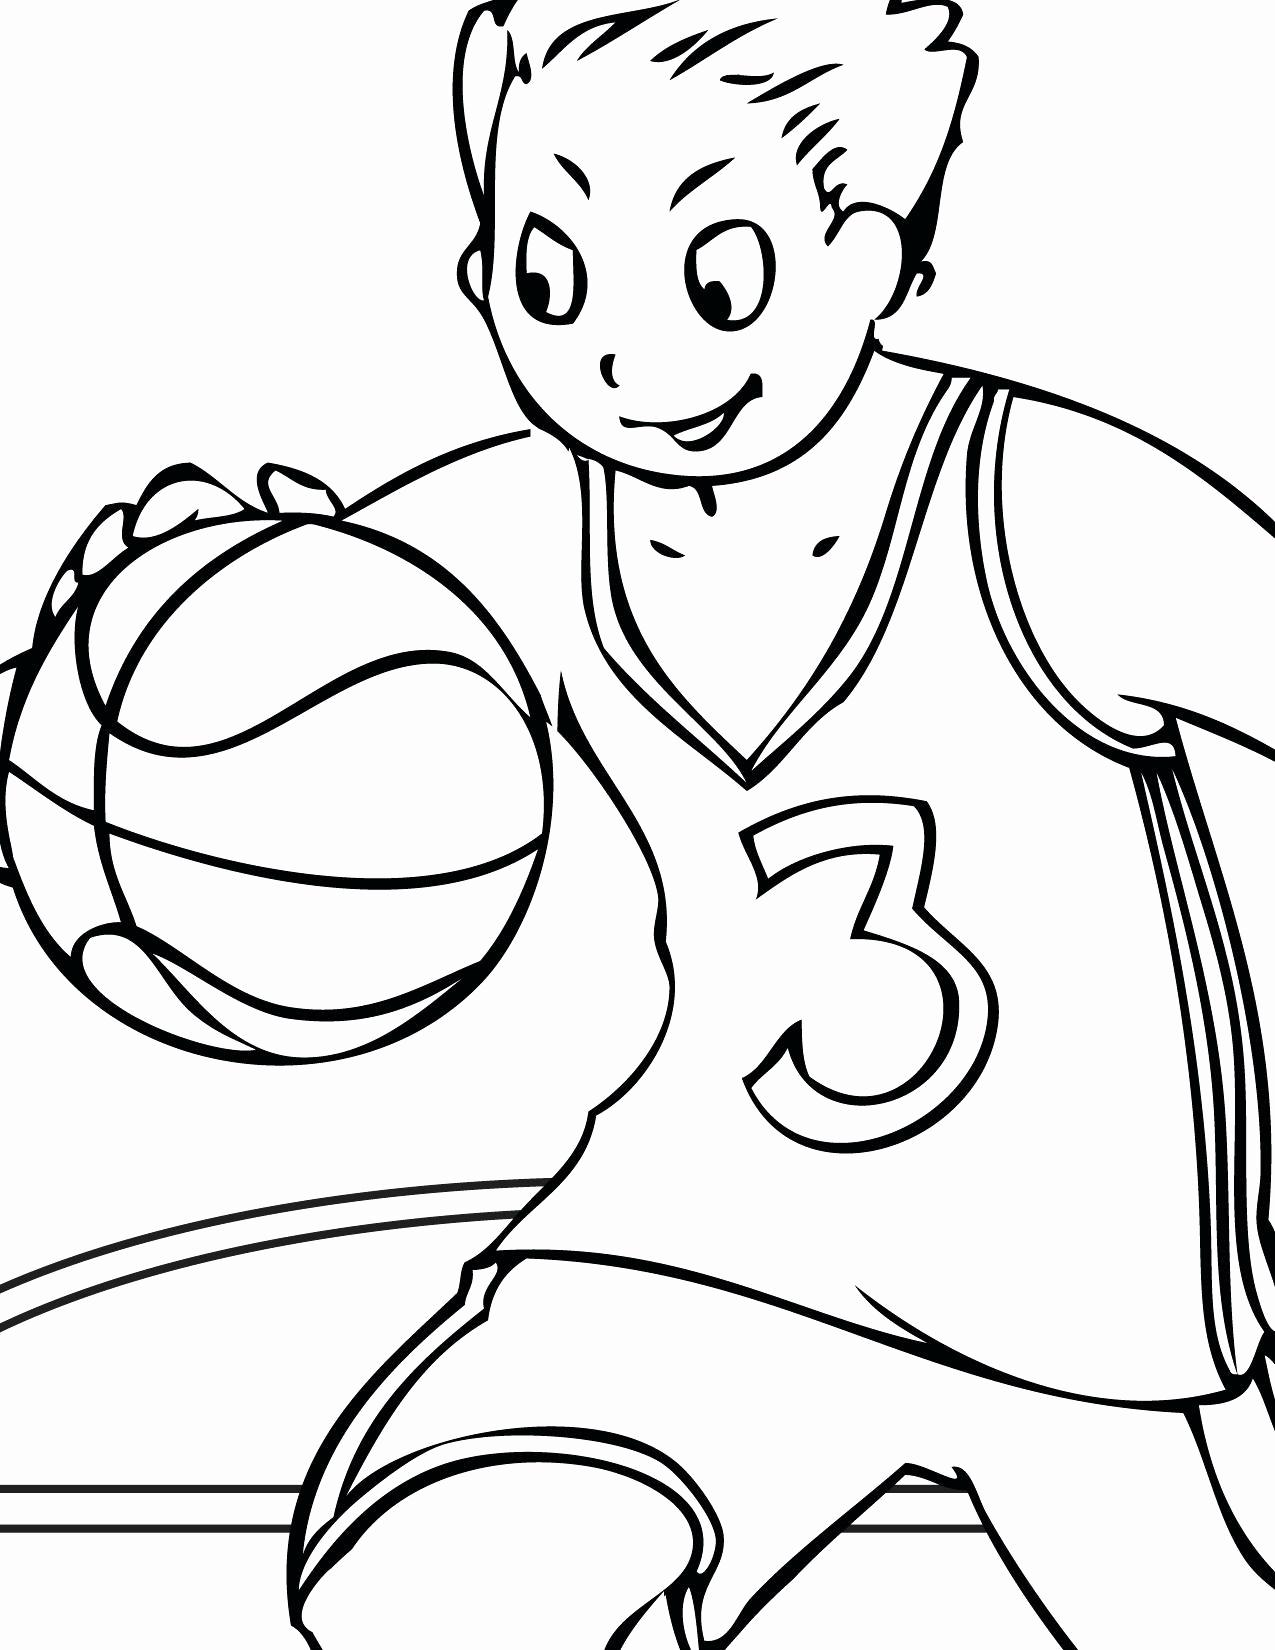 1275x1650 Printable Basketball Court Diagram Luxury Free Basketball Court